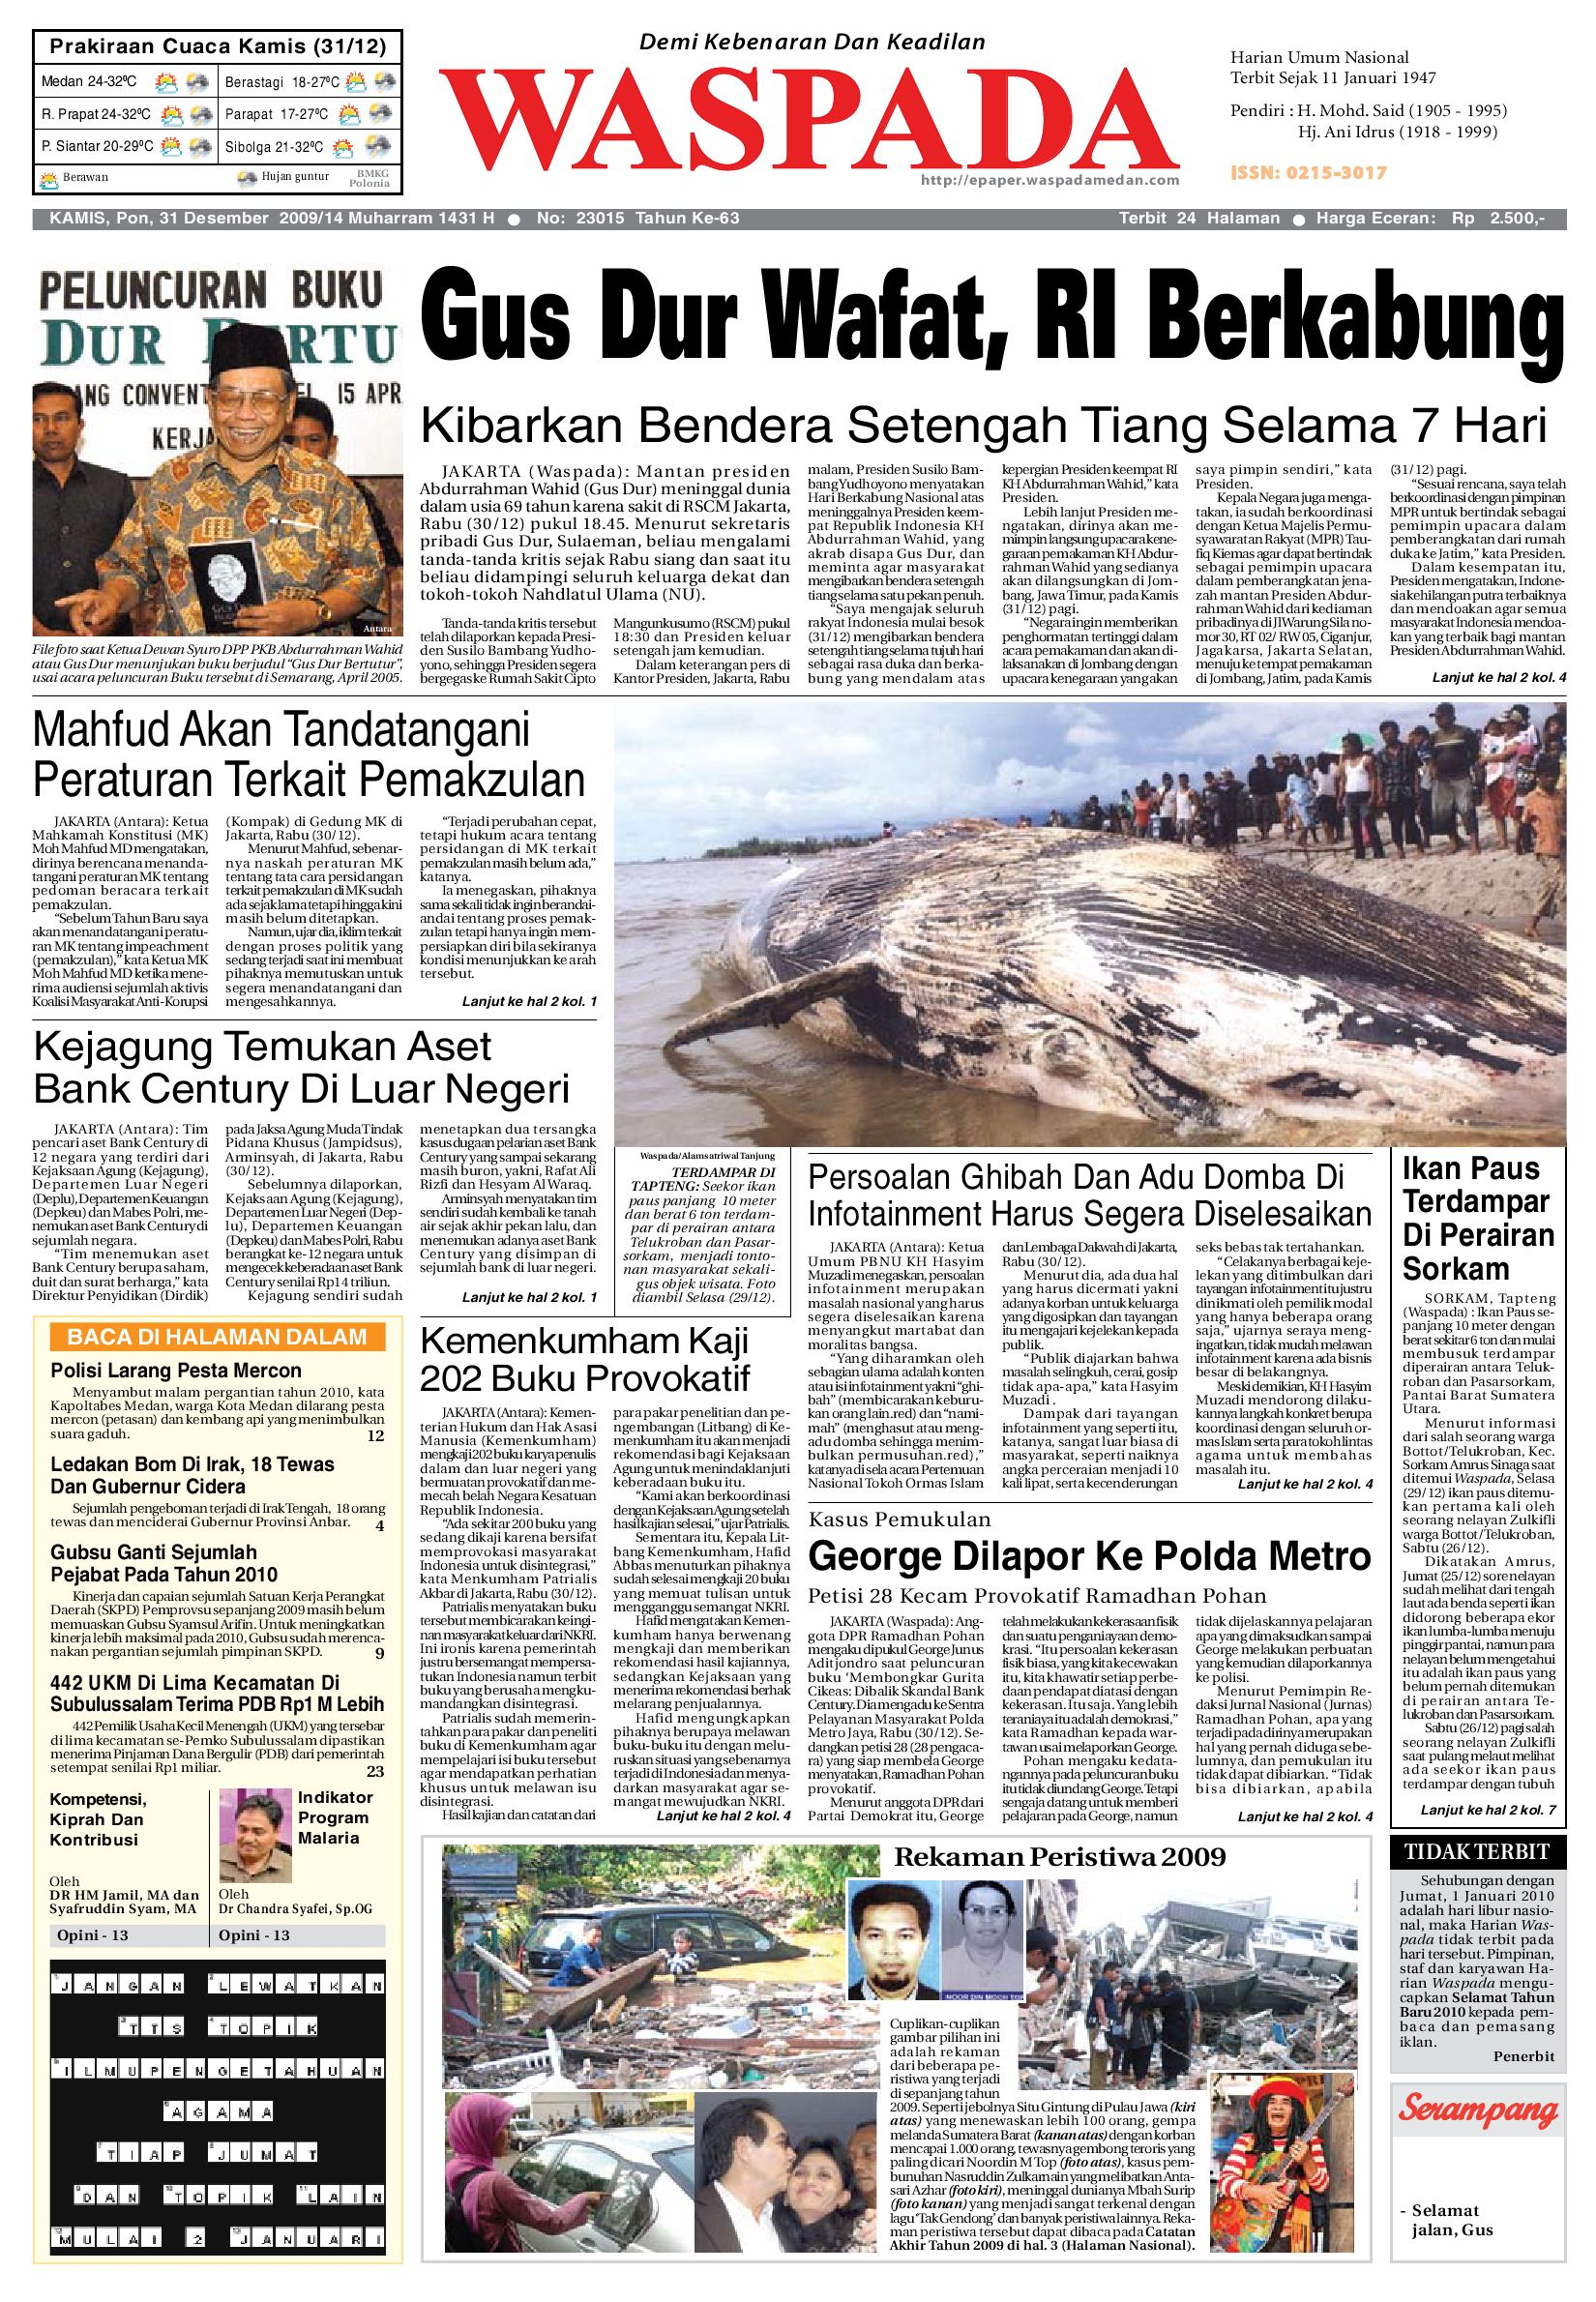 Waspada Kamis 31 Desember 2009 By Harian Issuu Produk Ukm Bumn Barbekyu Kelitik Surabaya